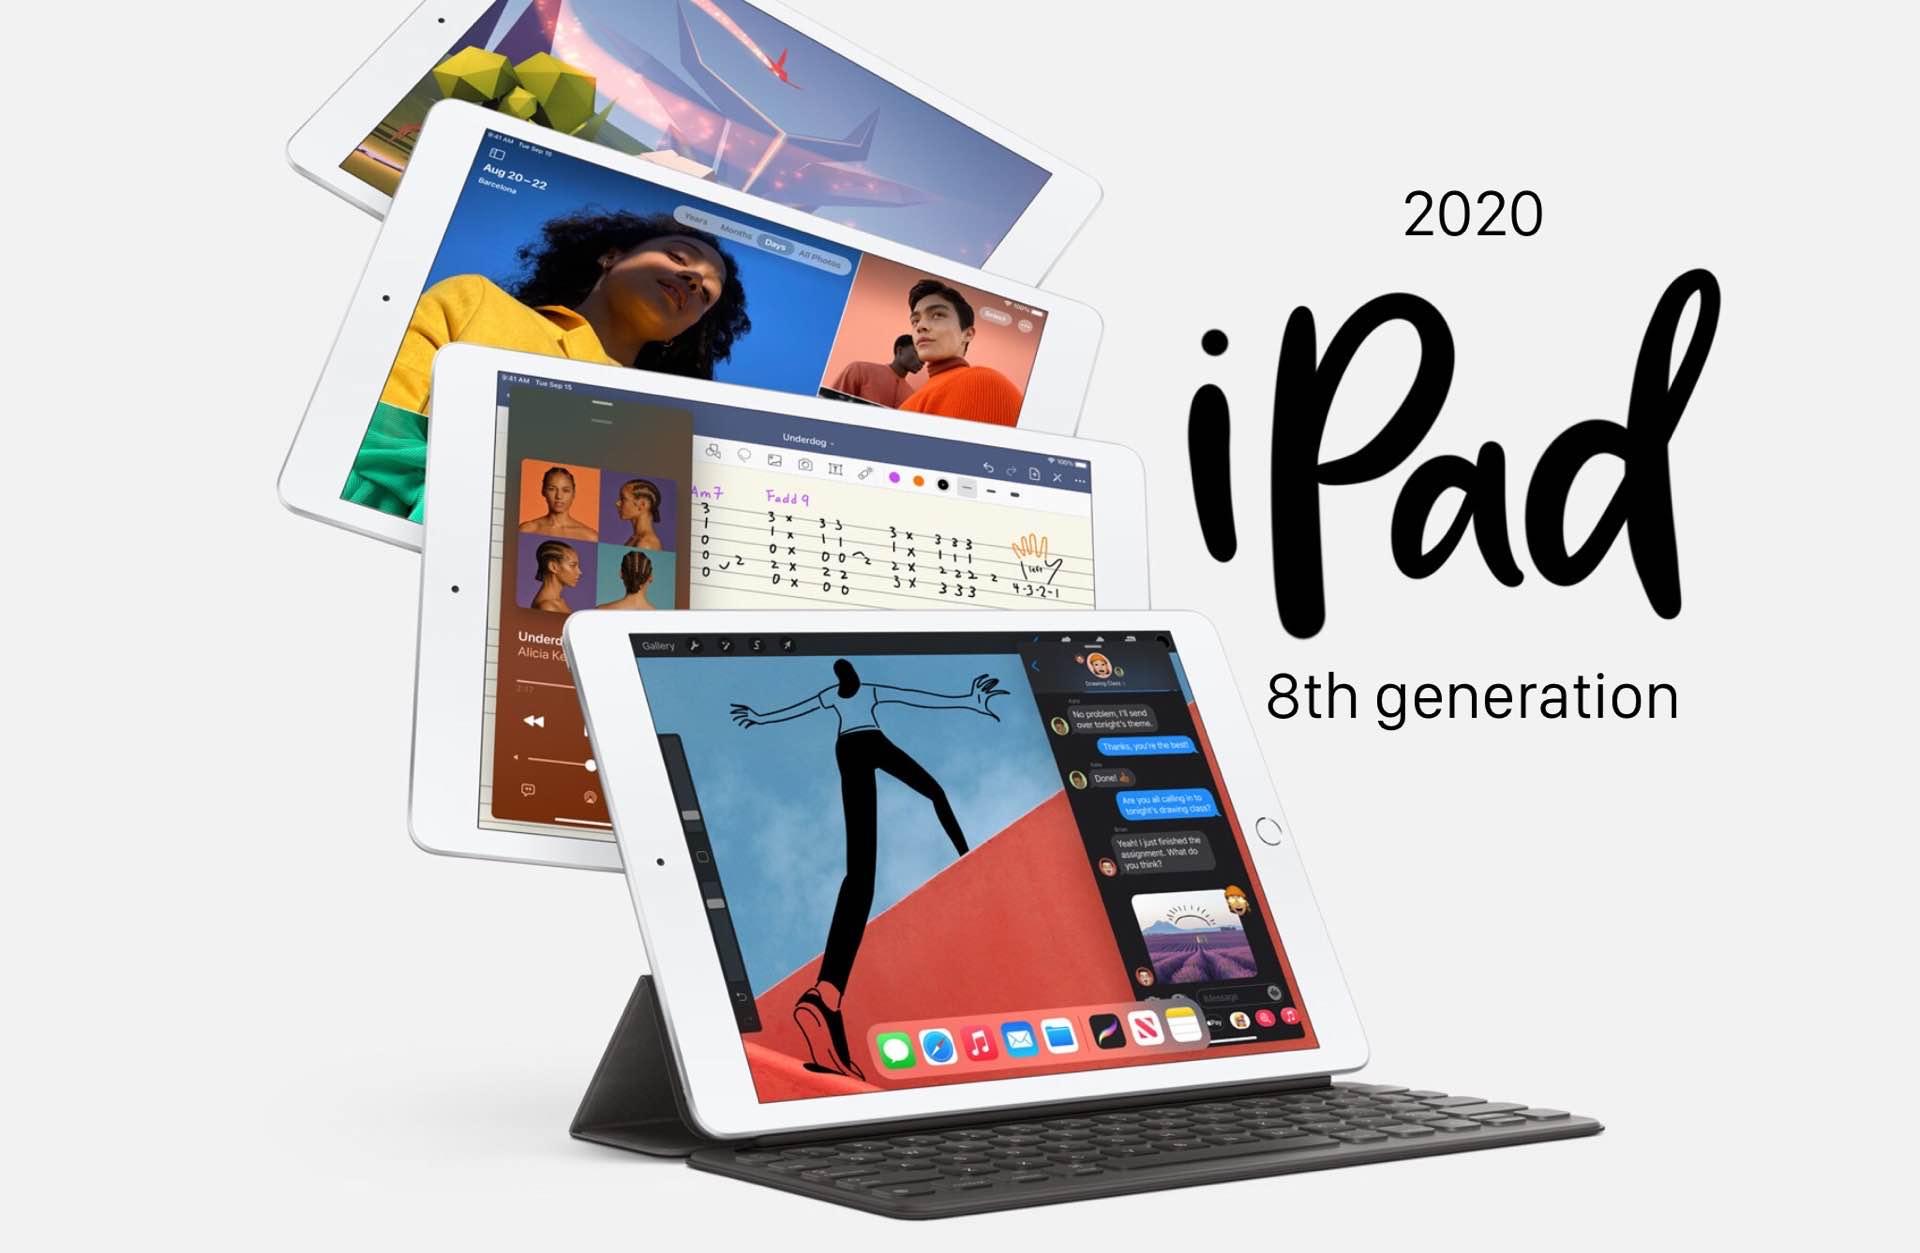 apple-ipad-2020-8th-generation